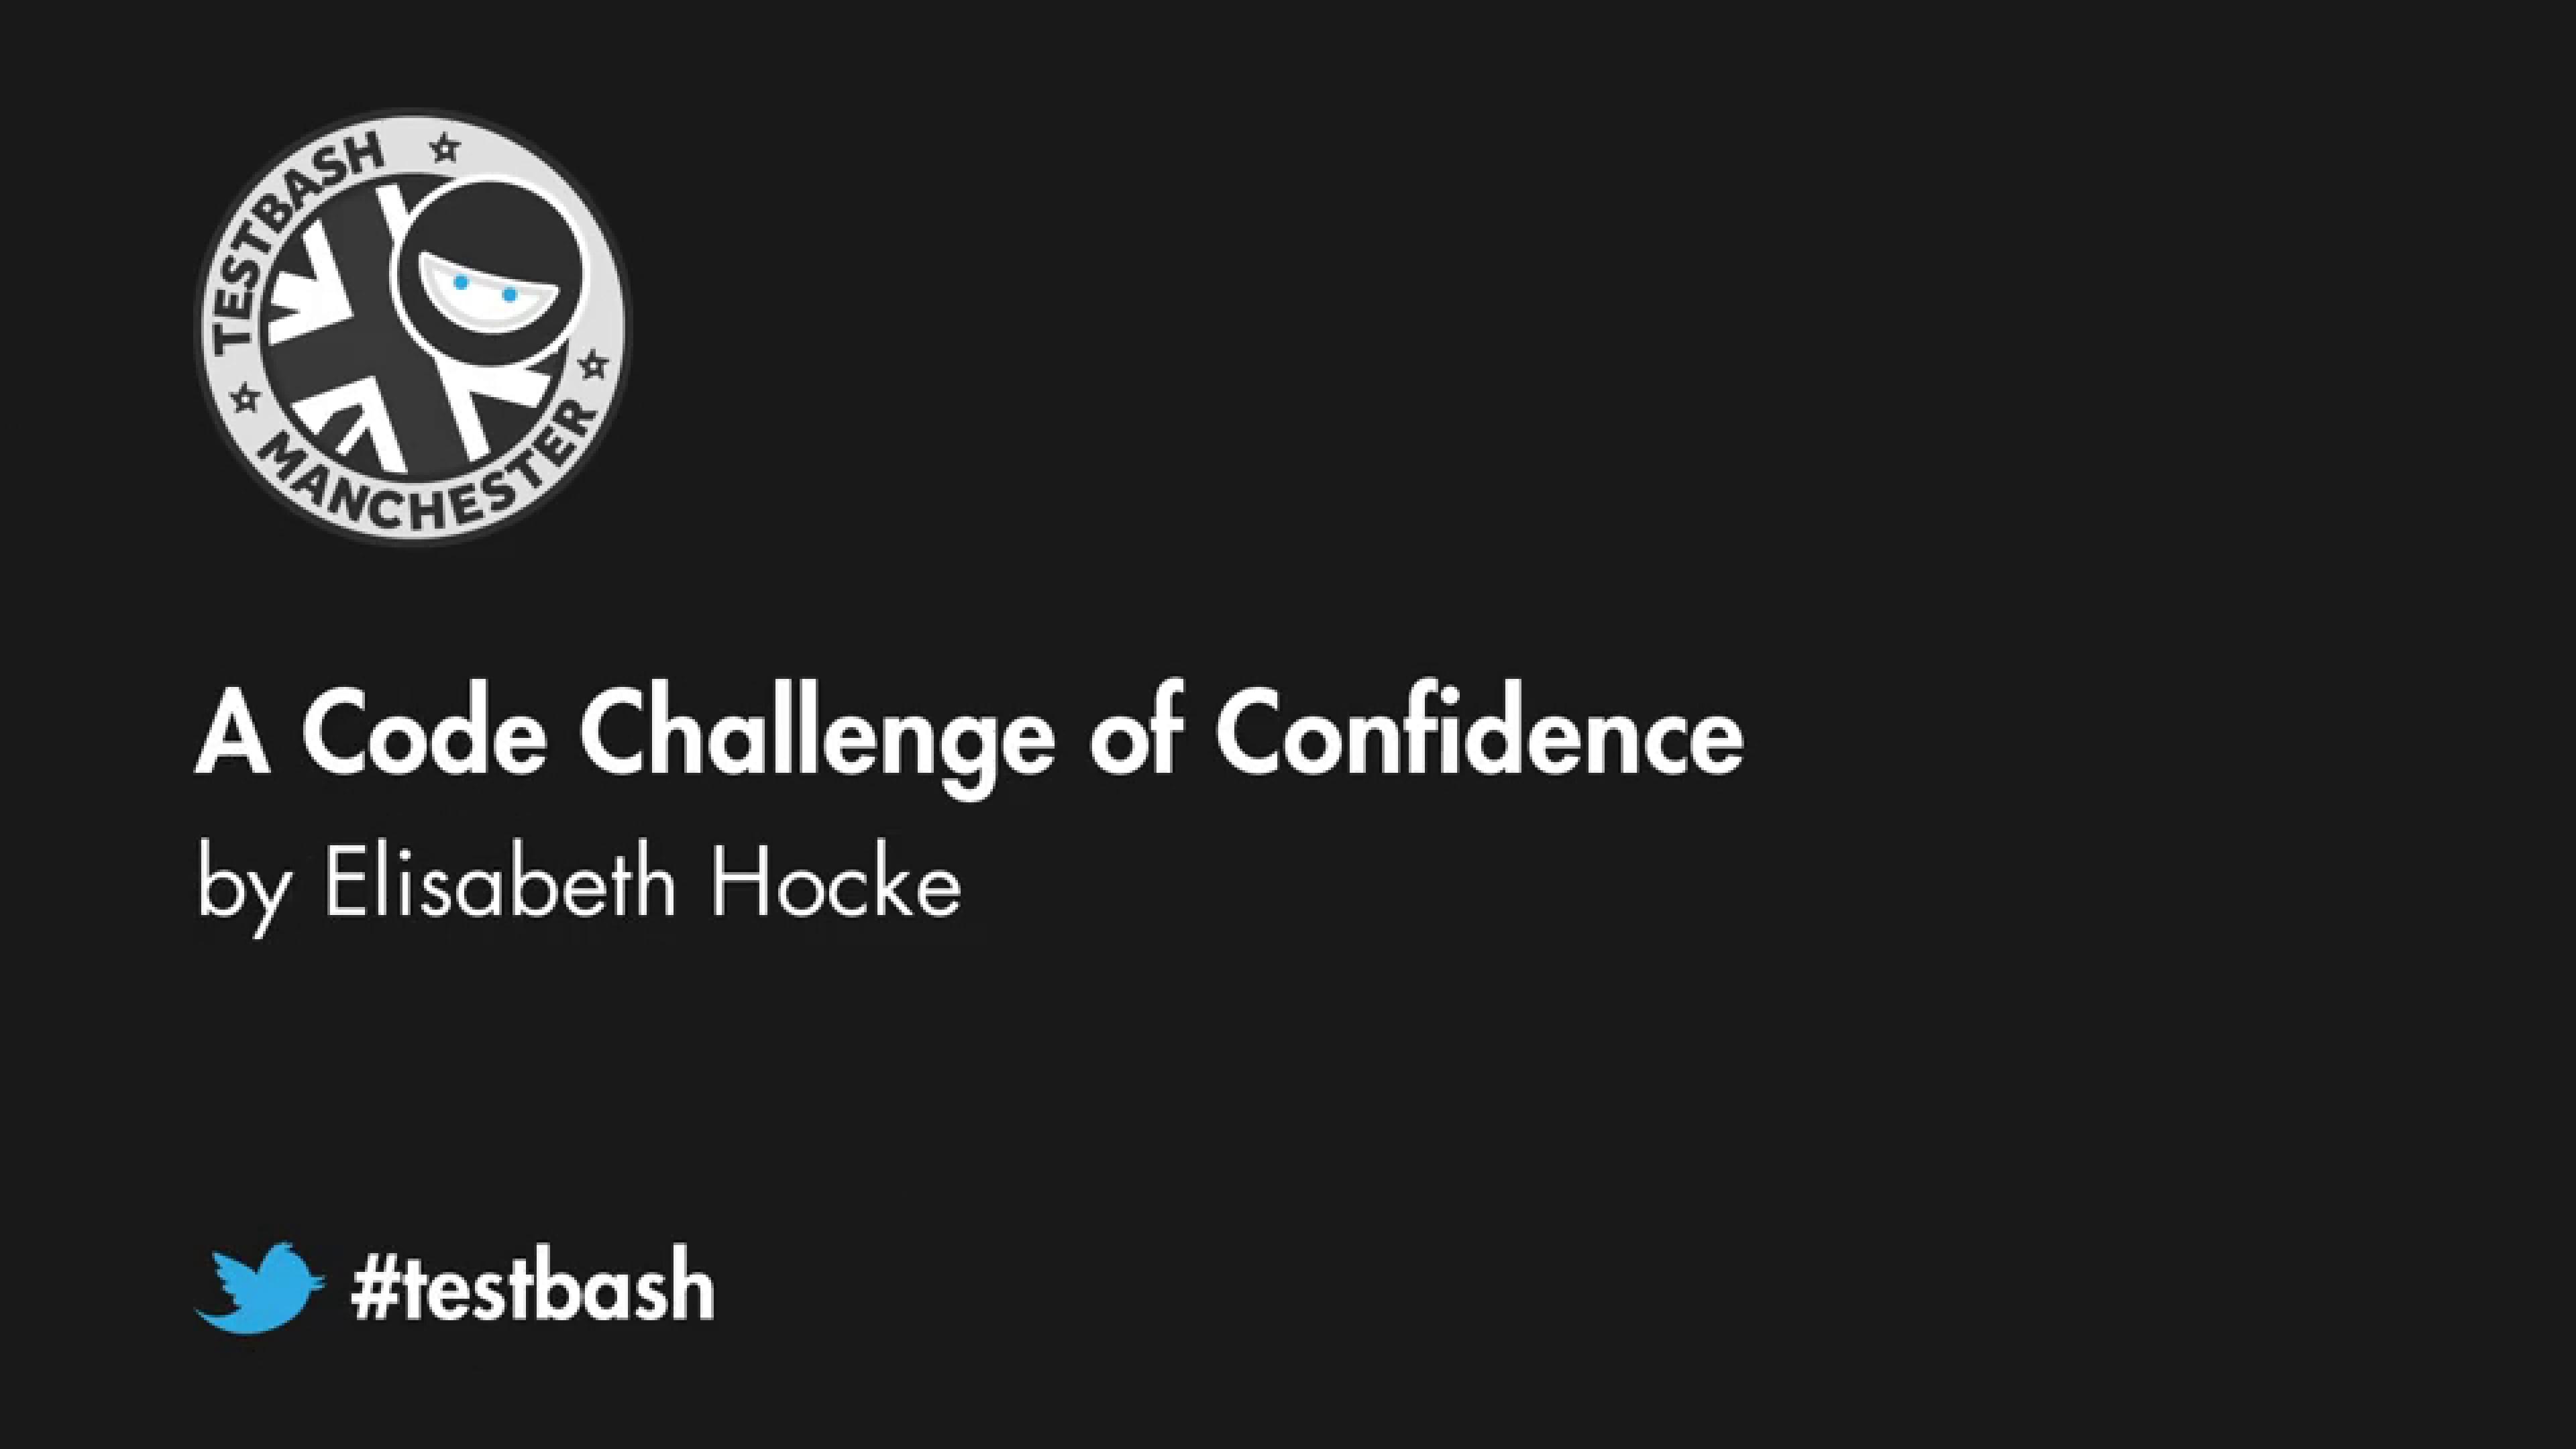 A Code Challenge of Confidence - Elisabeth Hocke